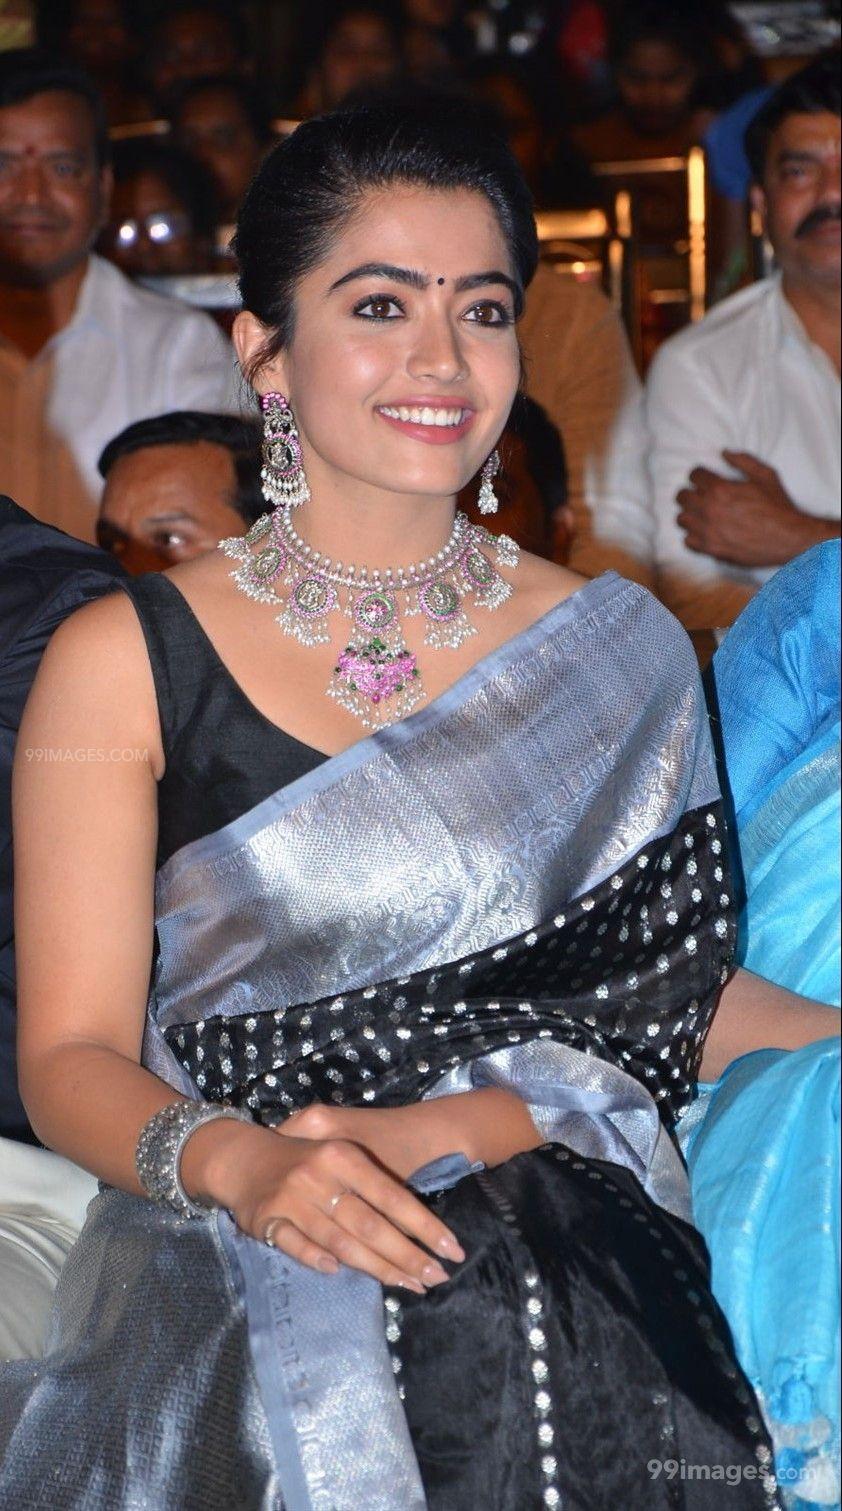 [105] Rashmika Mandanna Beautiful HD Photos Mobile Wallpapers 842x1511